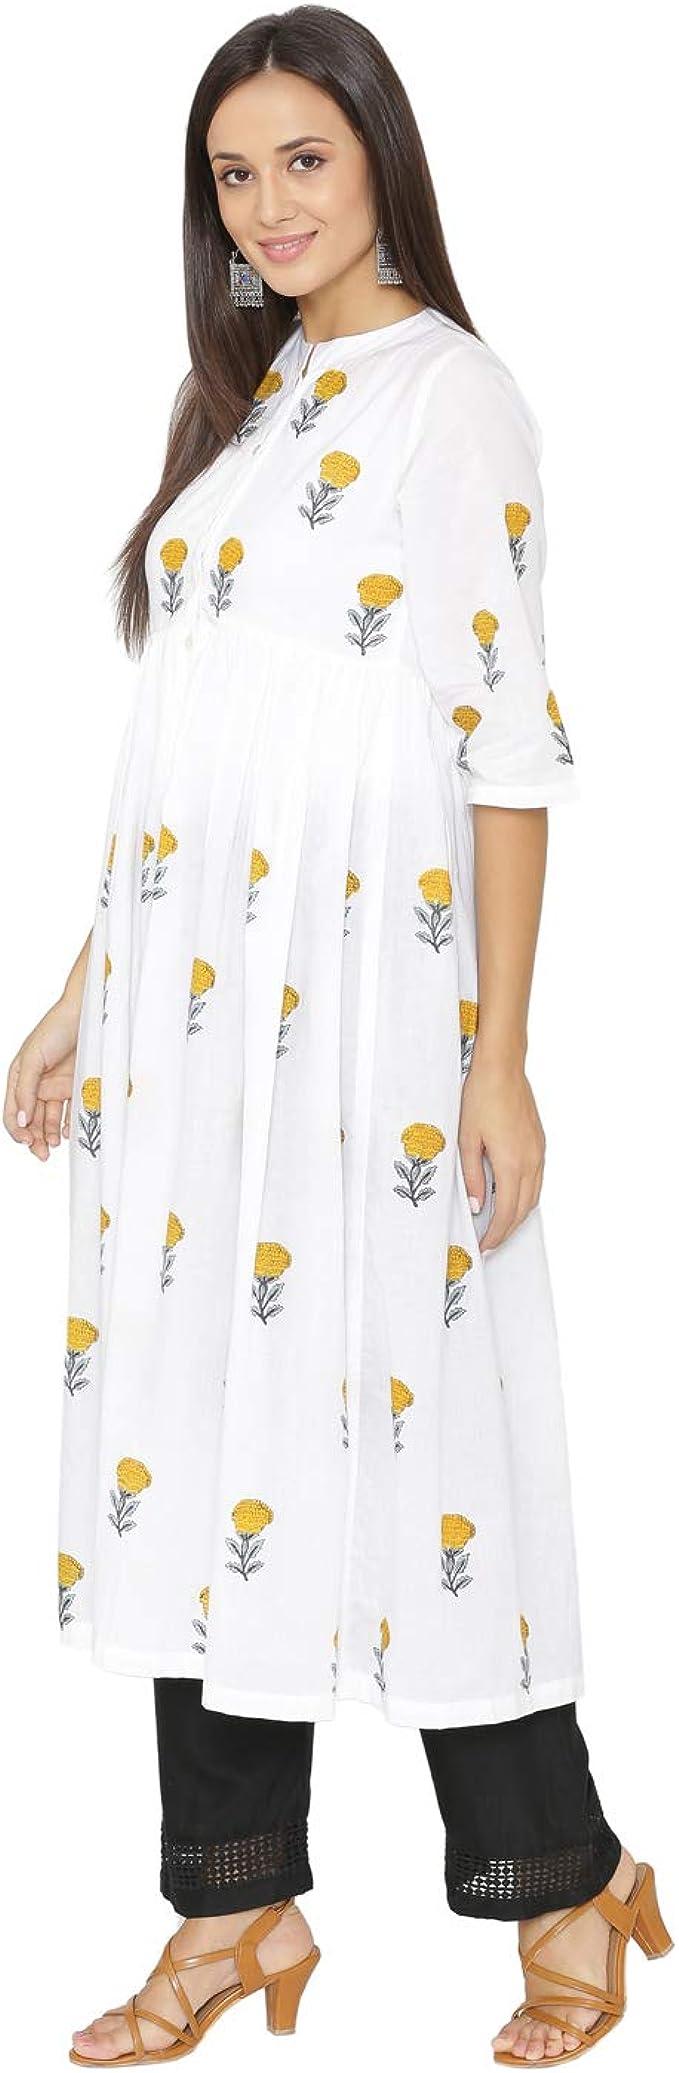 Kurta For Girls. Handmade Indian Woman Green Party Wear Indian Dress Stylish Pure Cotton Woman Long Kurti